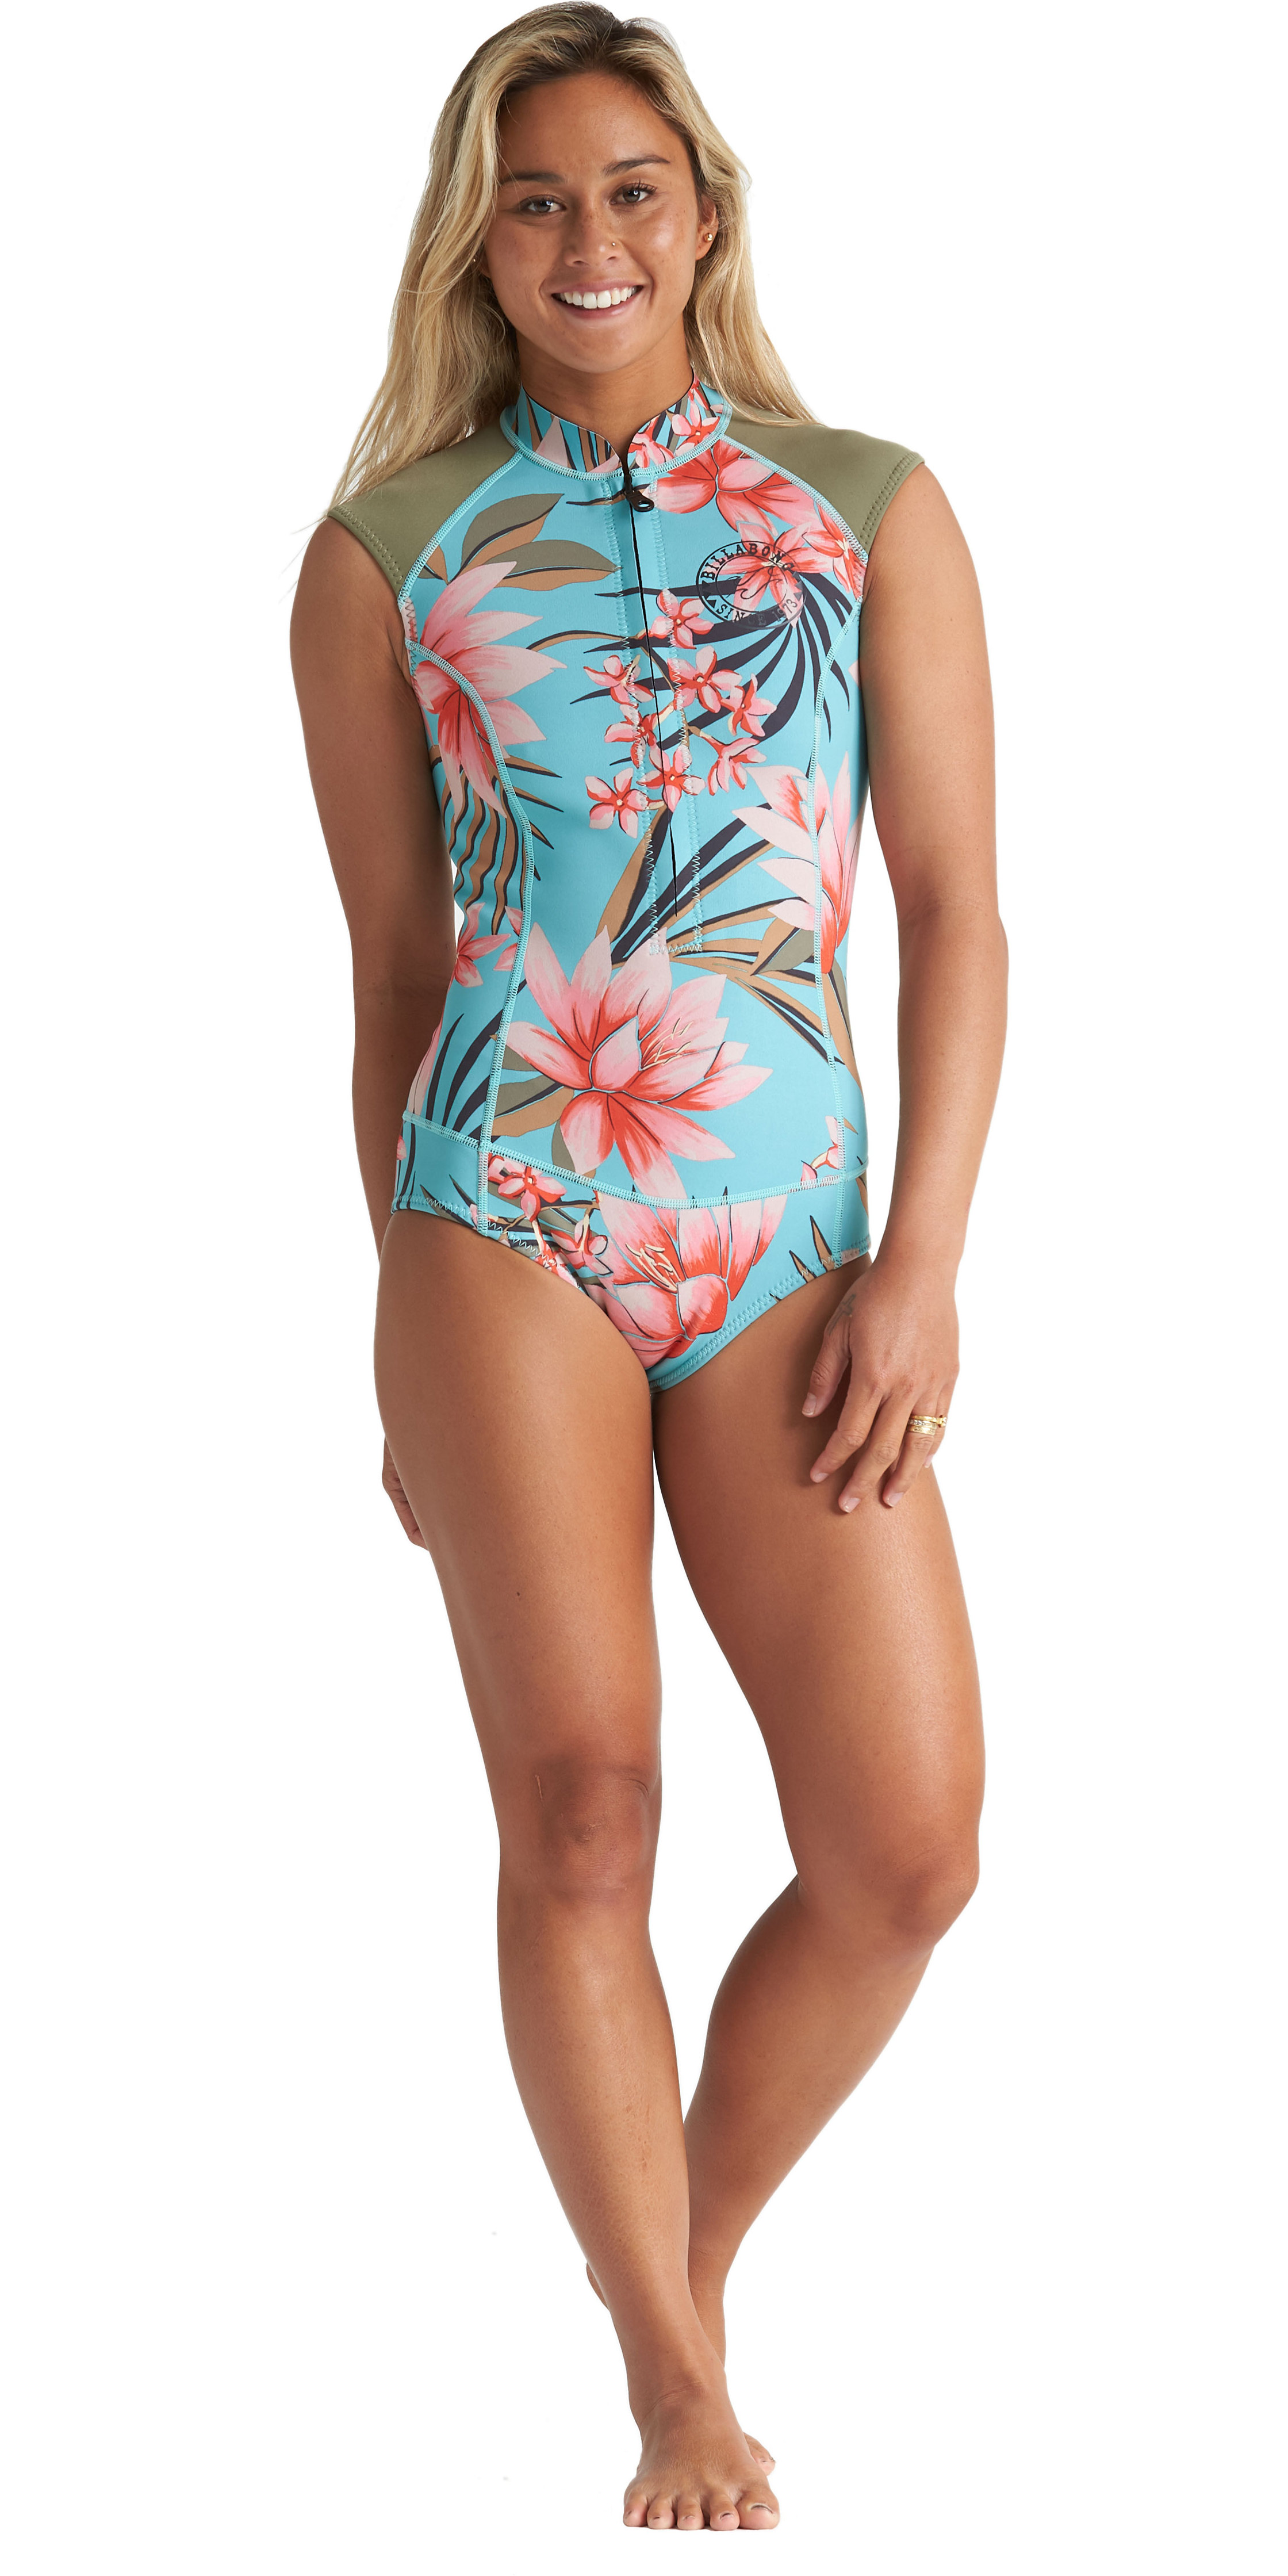 billabong bikini sverige